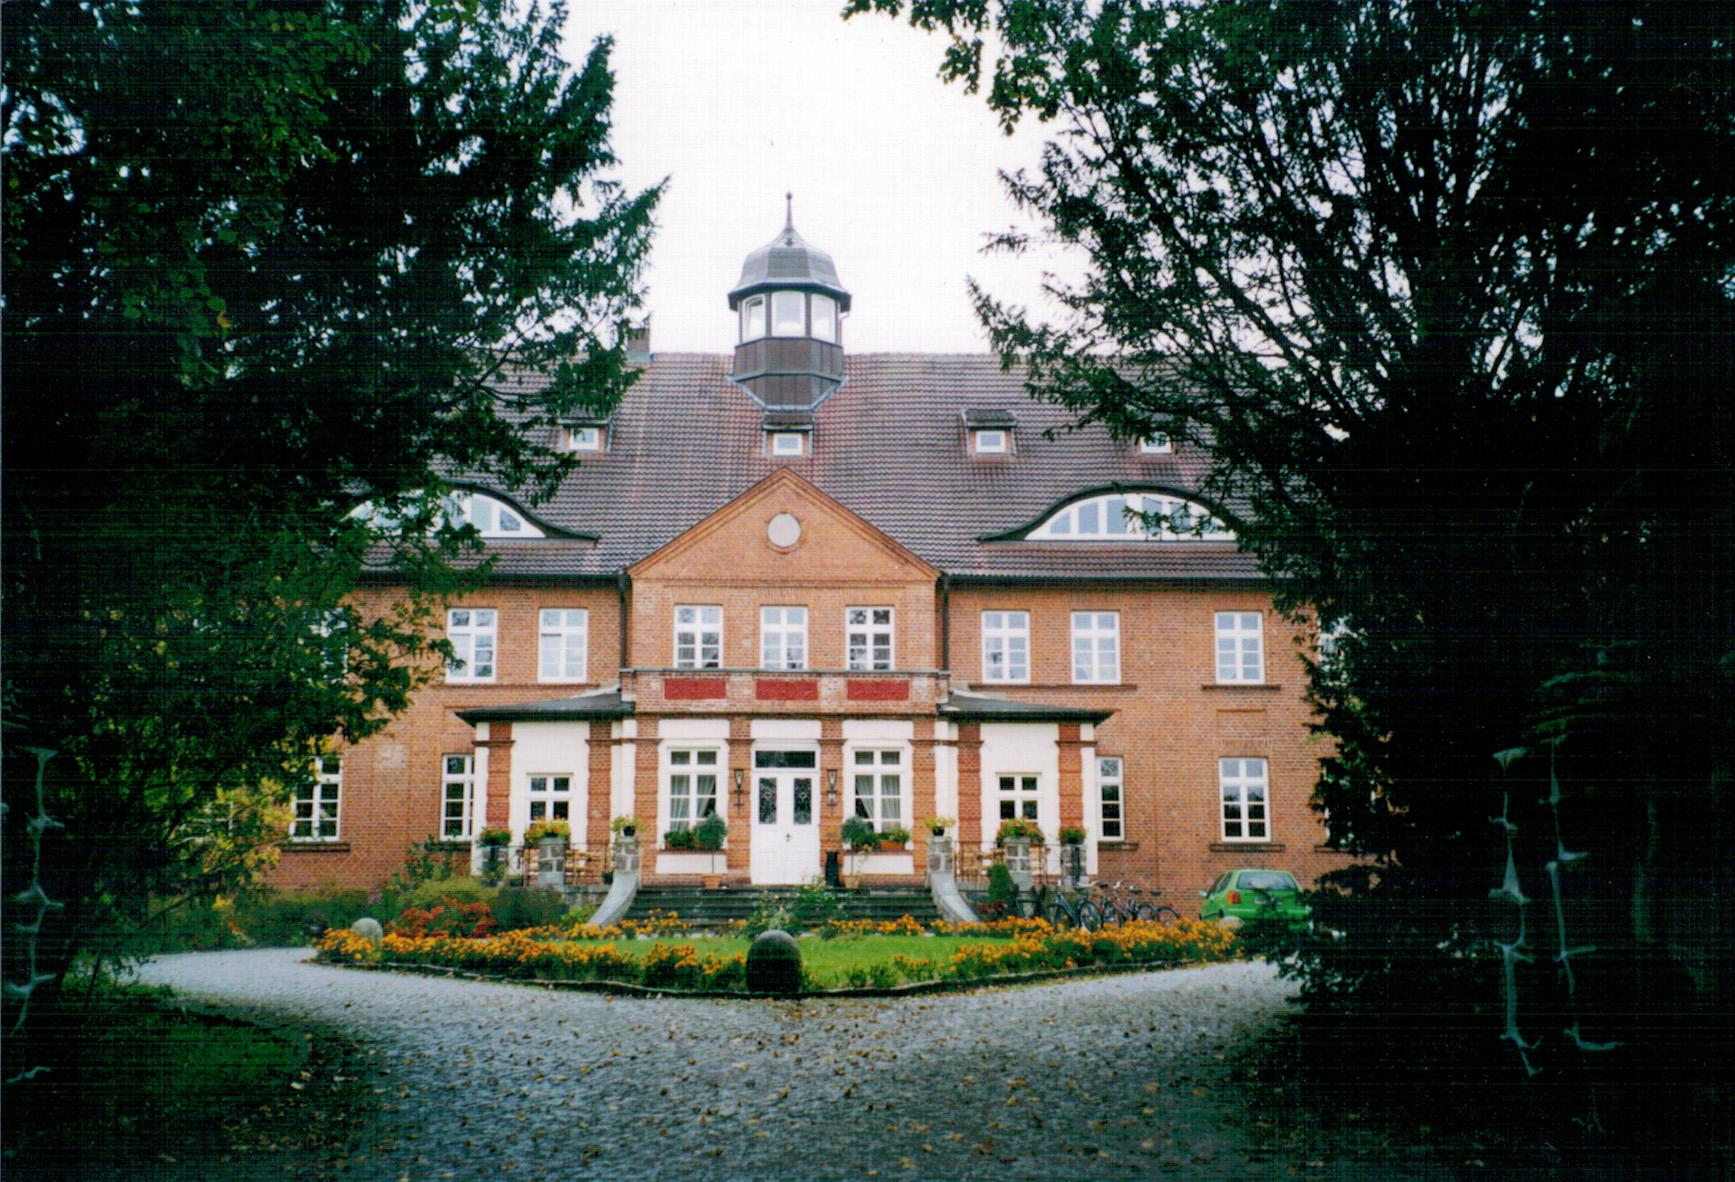 HOTEL SCHLOSS BASTHORST